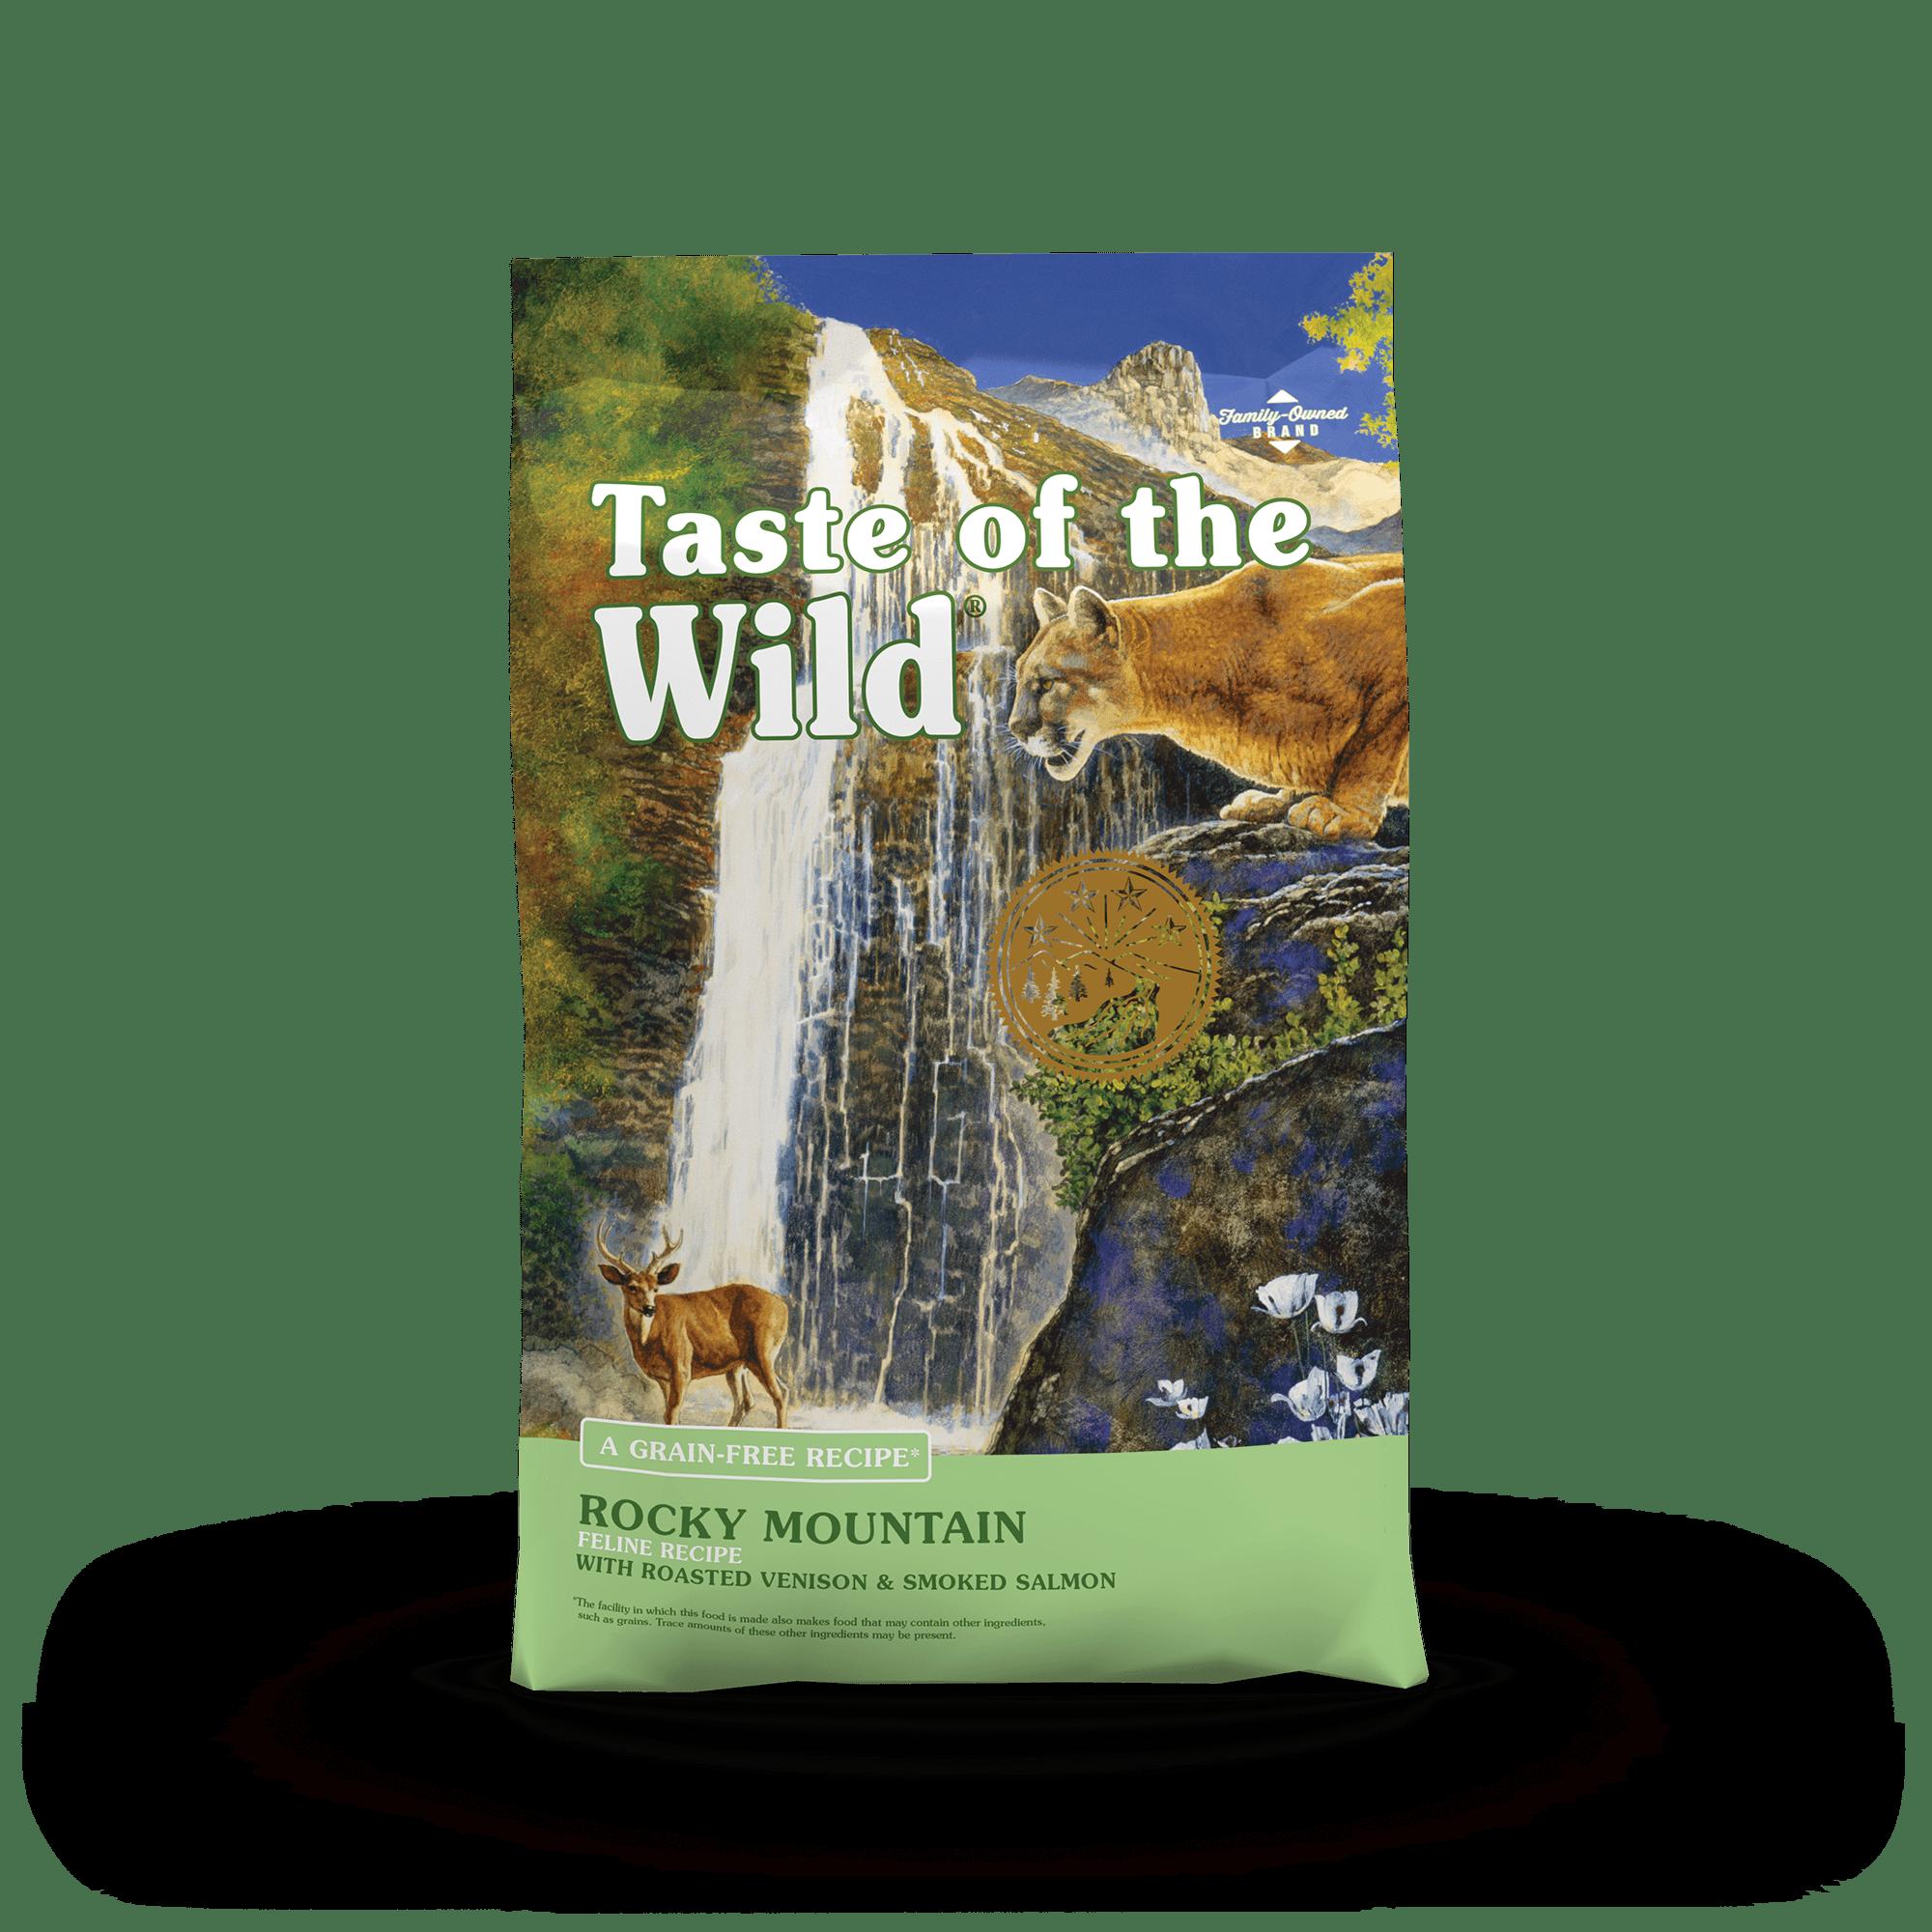 Rocky Mountain Feline Recipe with Roasted Venison & Smoked Salmon Image